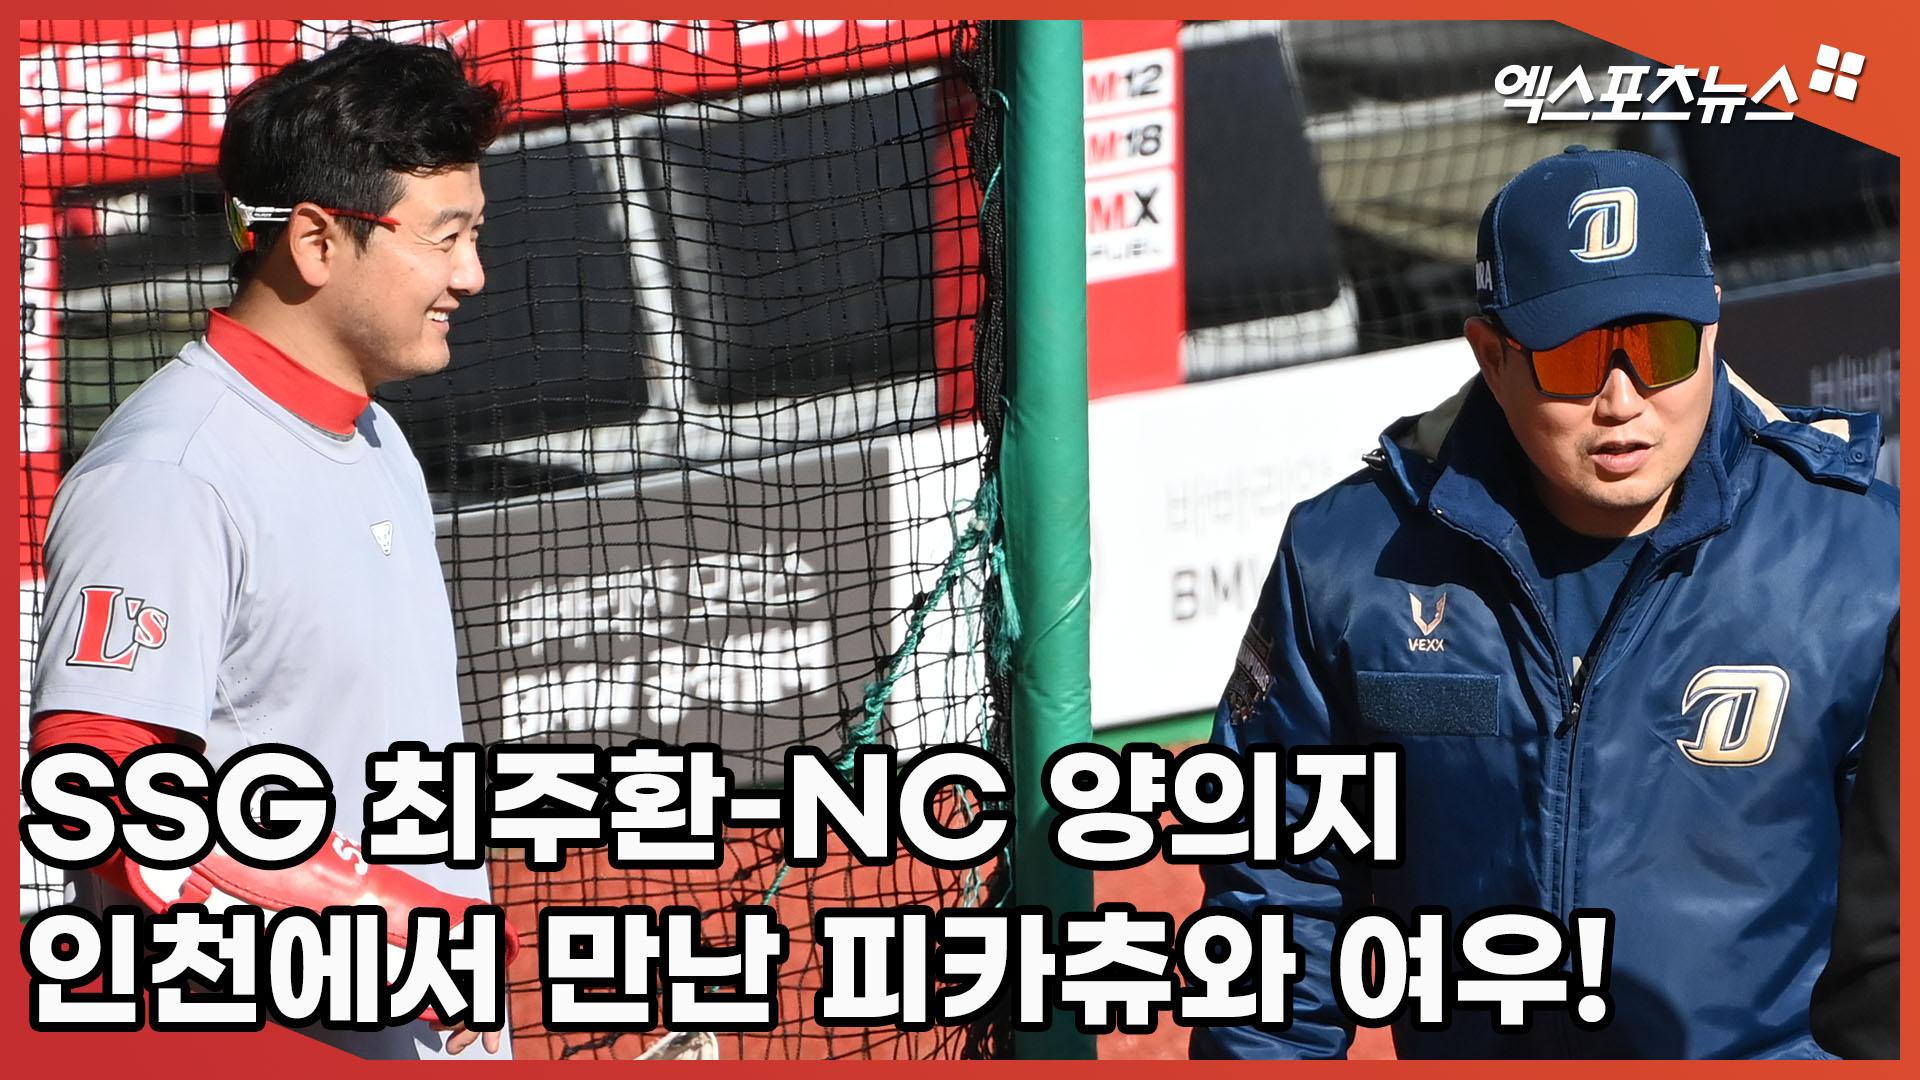 SSG 최주환- NC 양의지, 인천에서 만난 피카츄와 여우 [엑's 스케치]